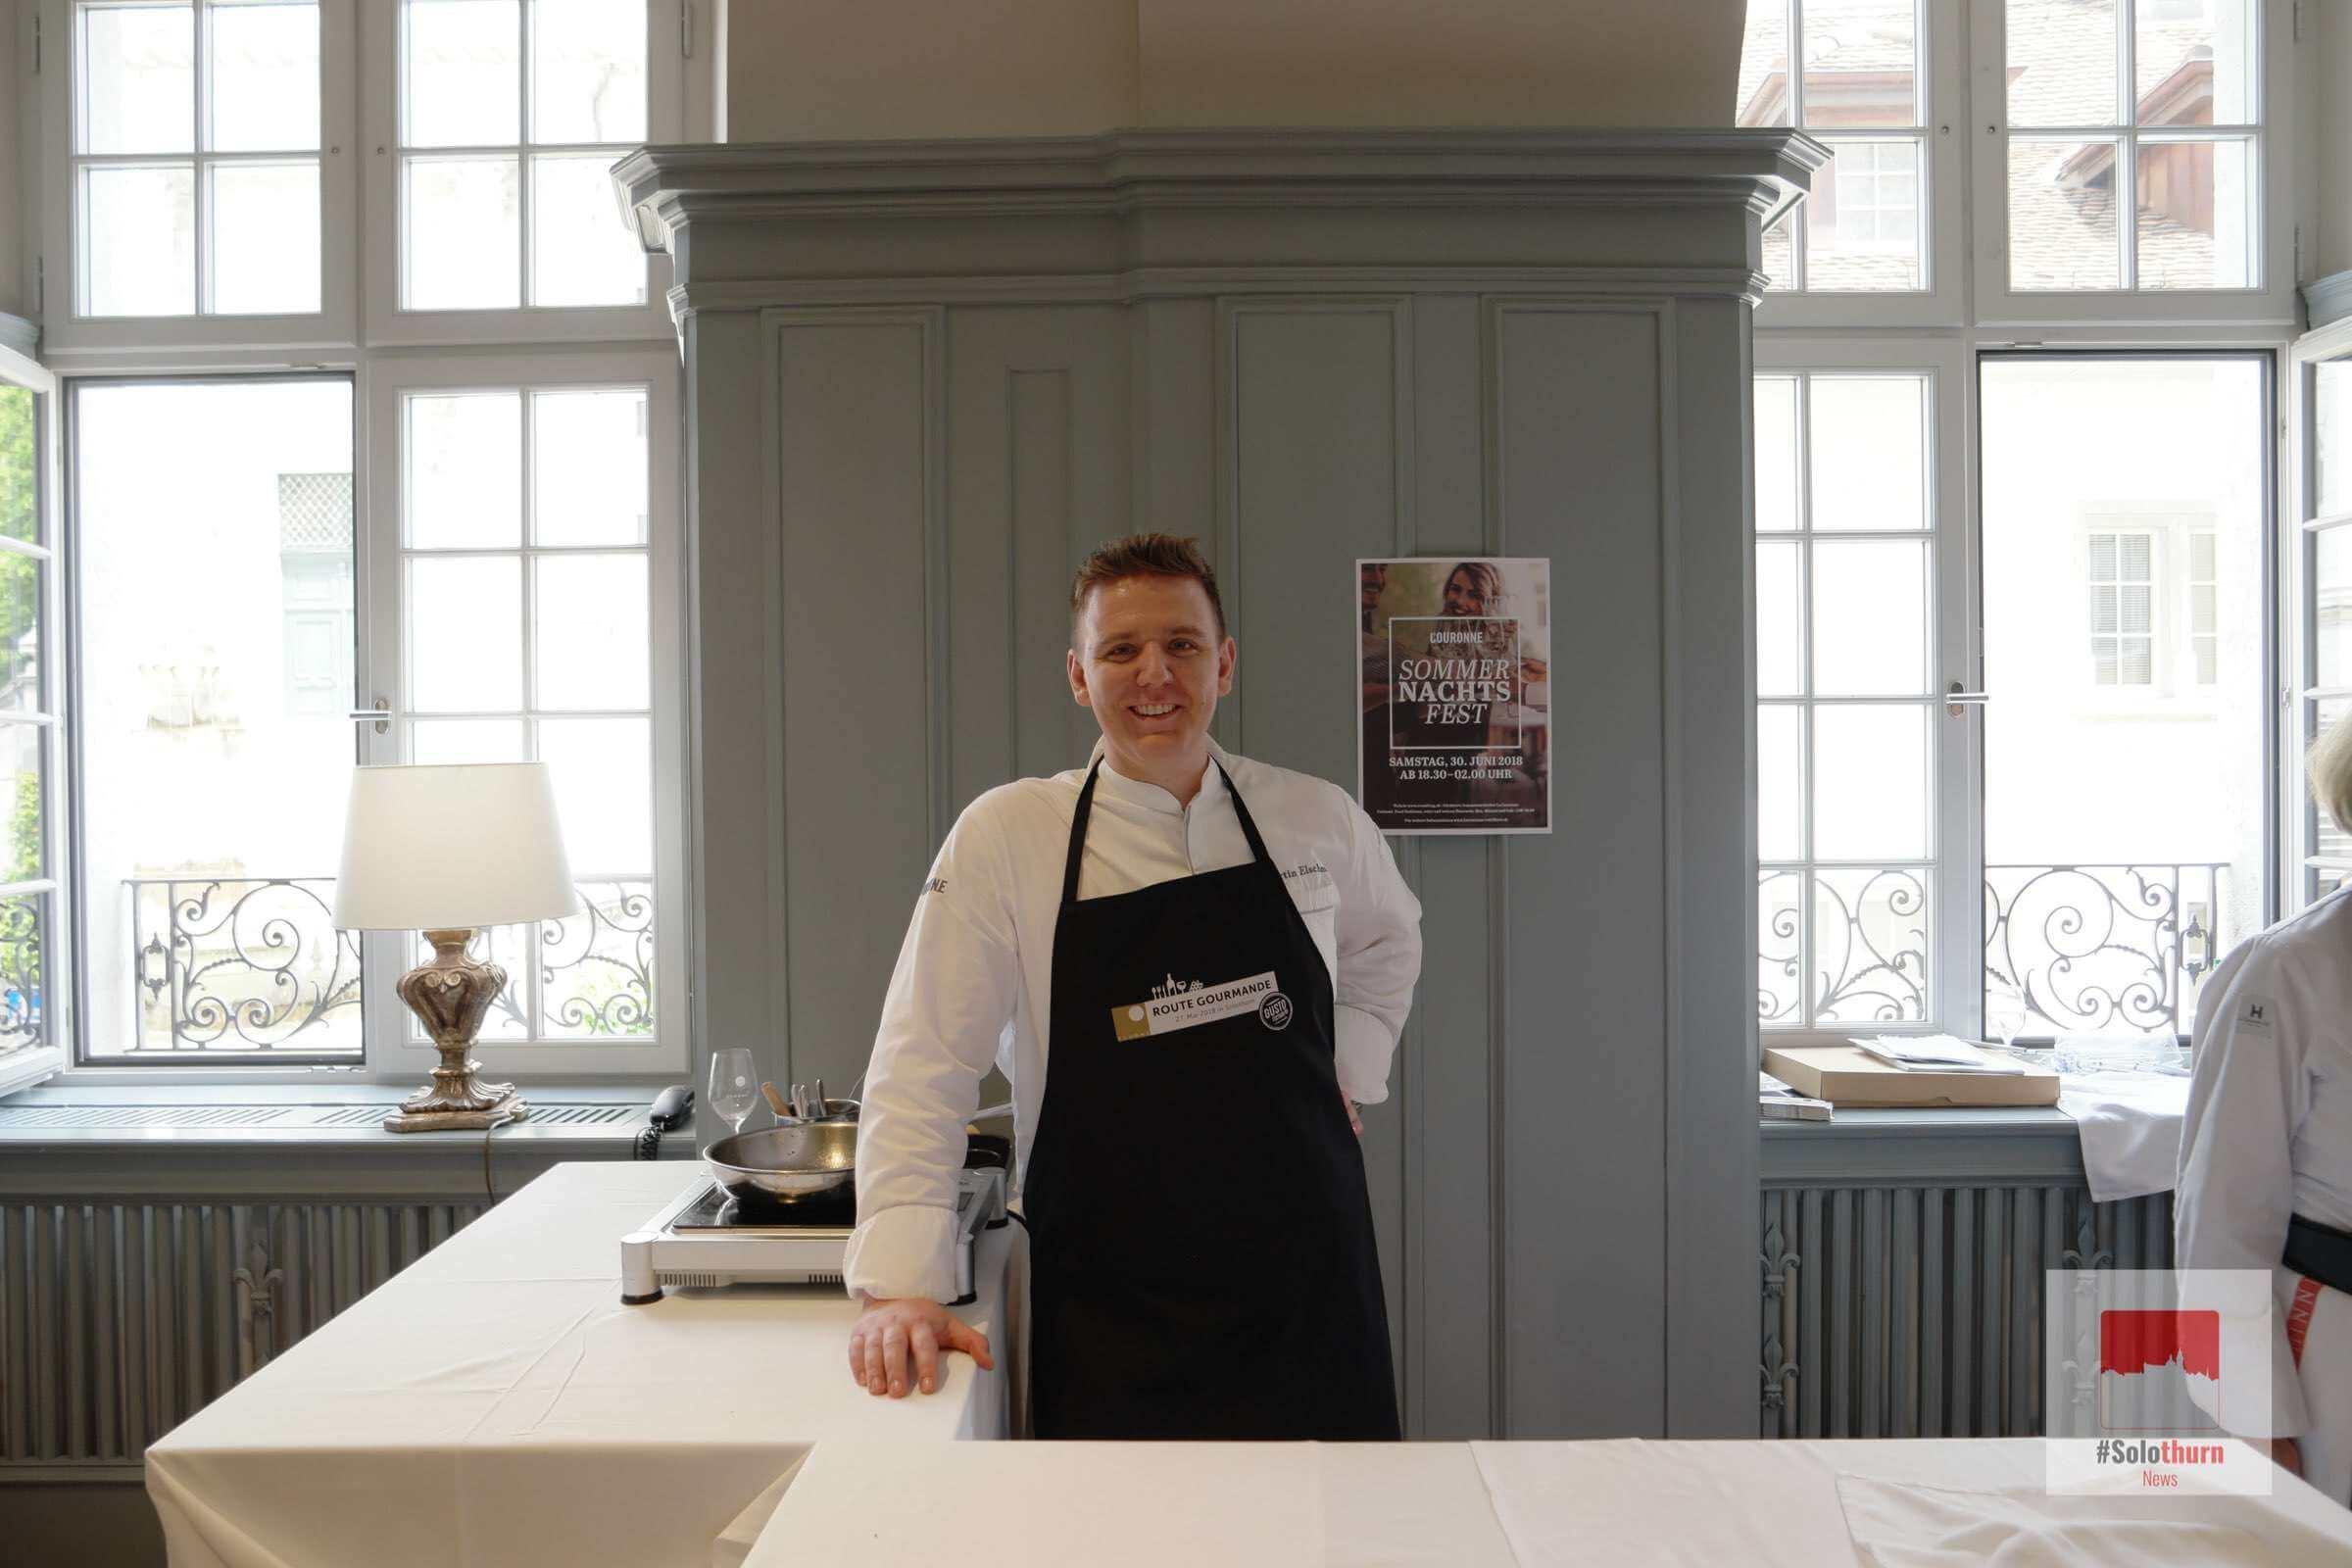 Martin Elschner (Hotel de la Couronne)